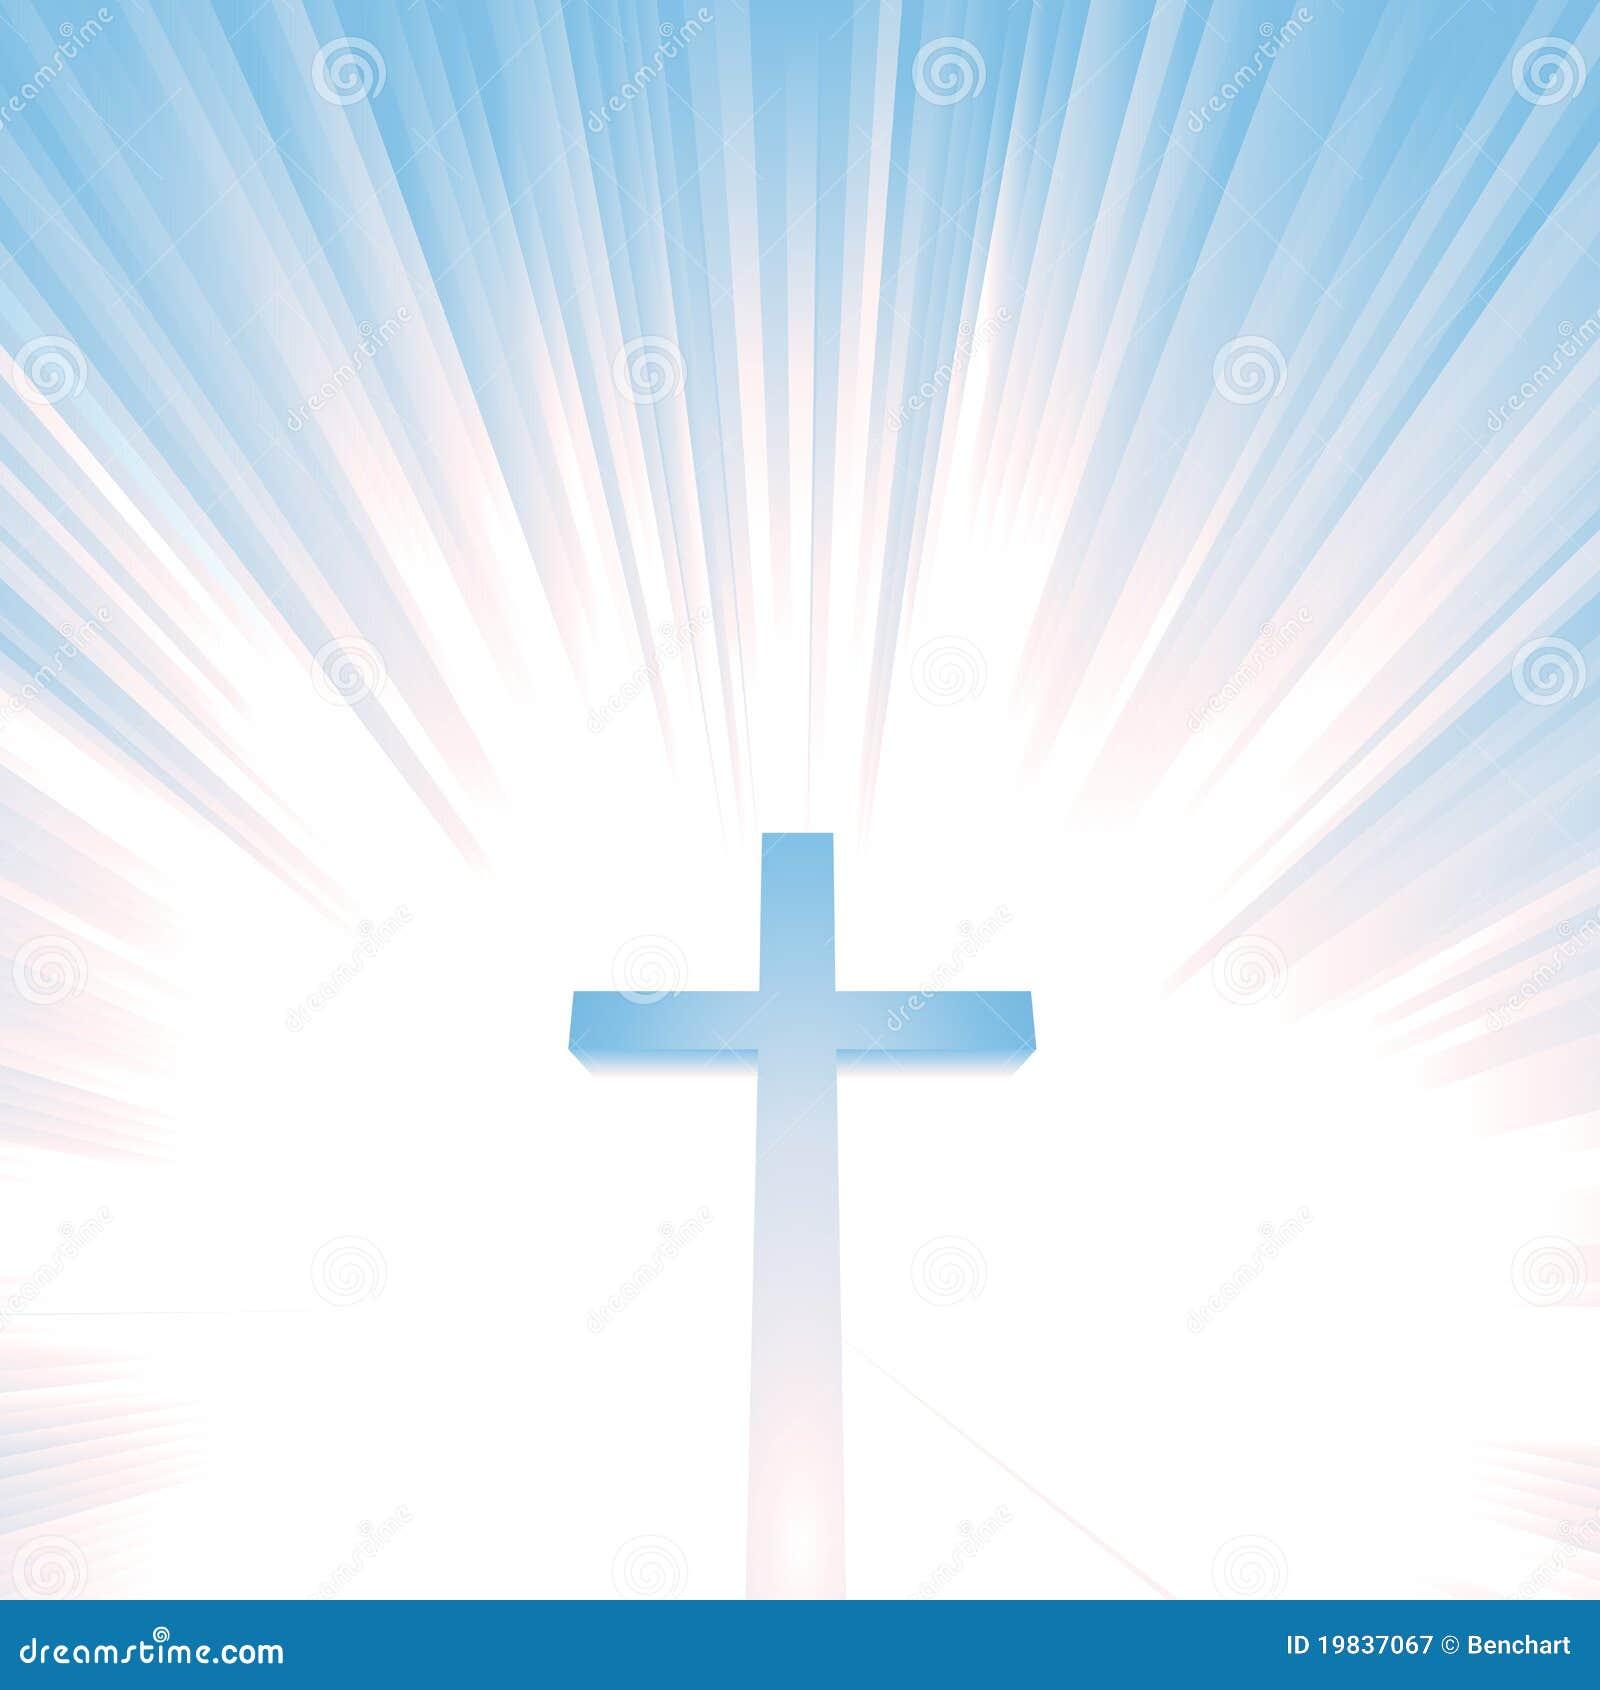 free christian clipart heaven - photo #26